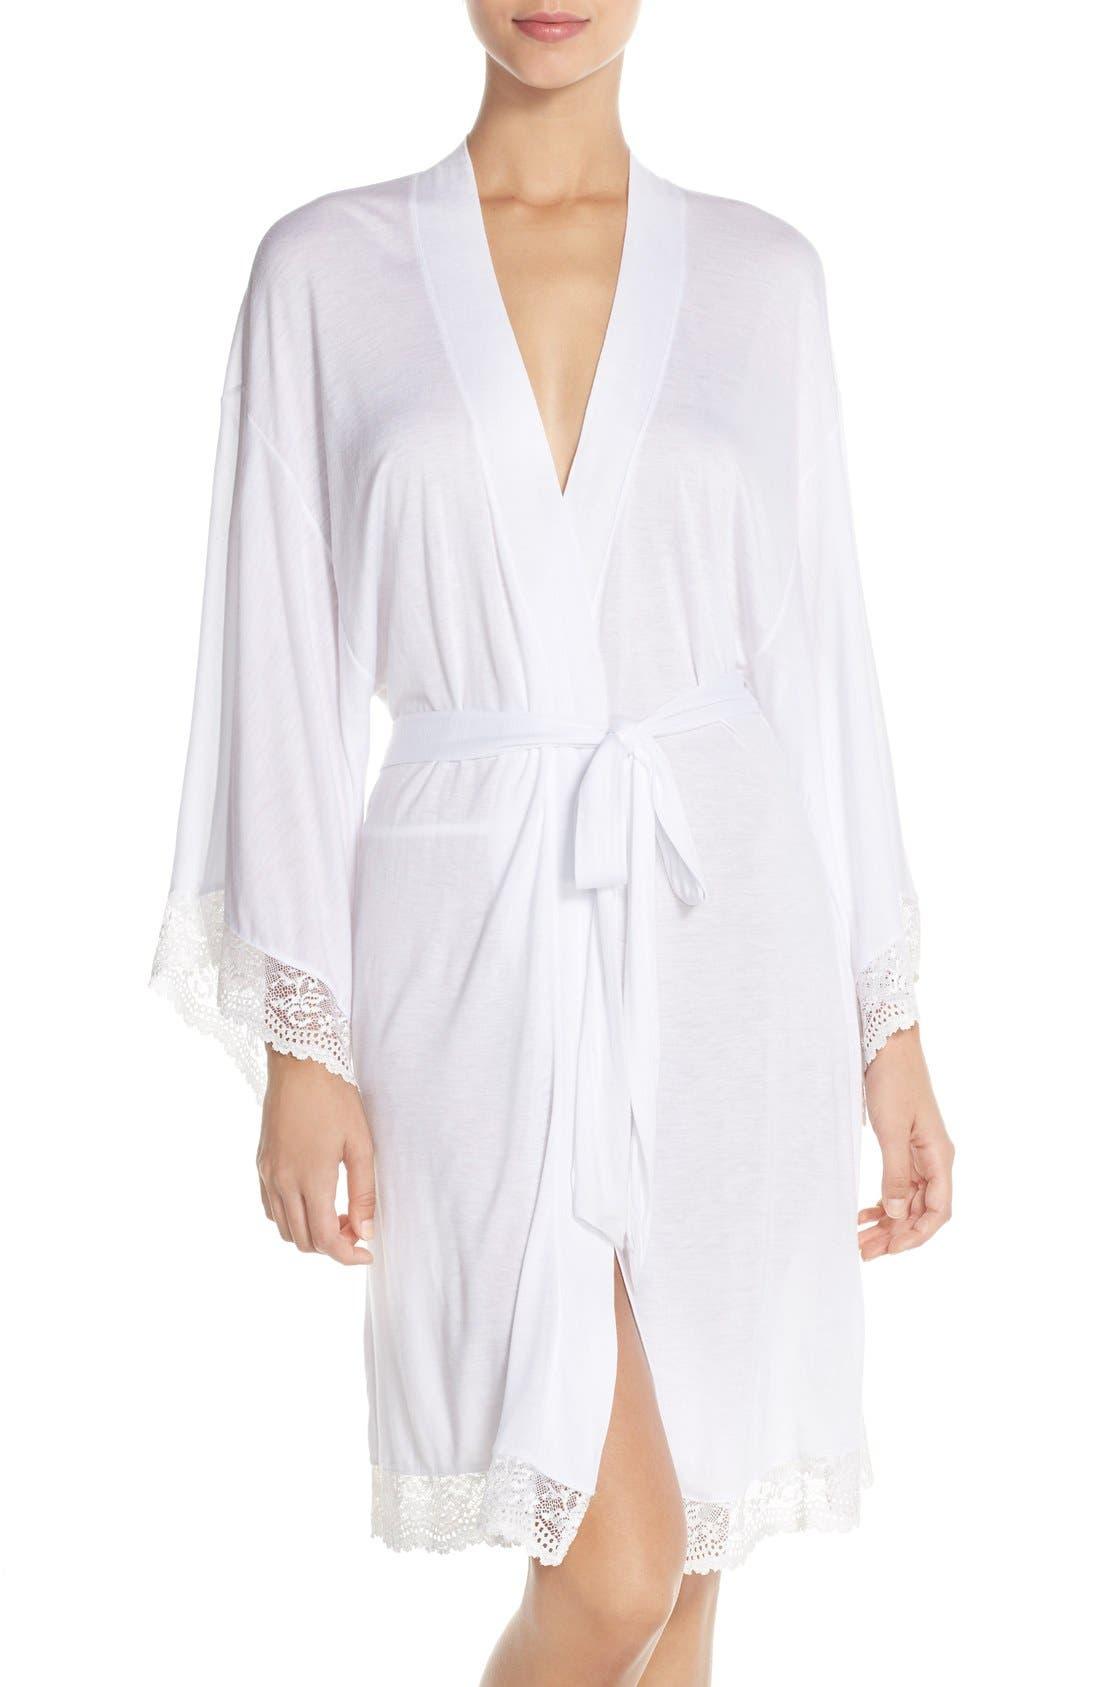 Main Image - Eberjey 'Colette' Kimono Robe